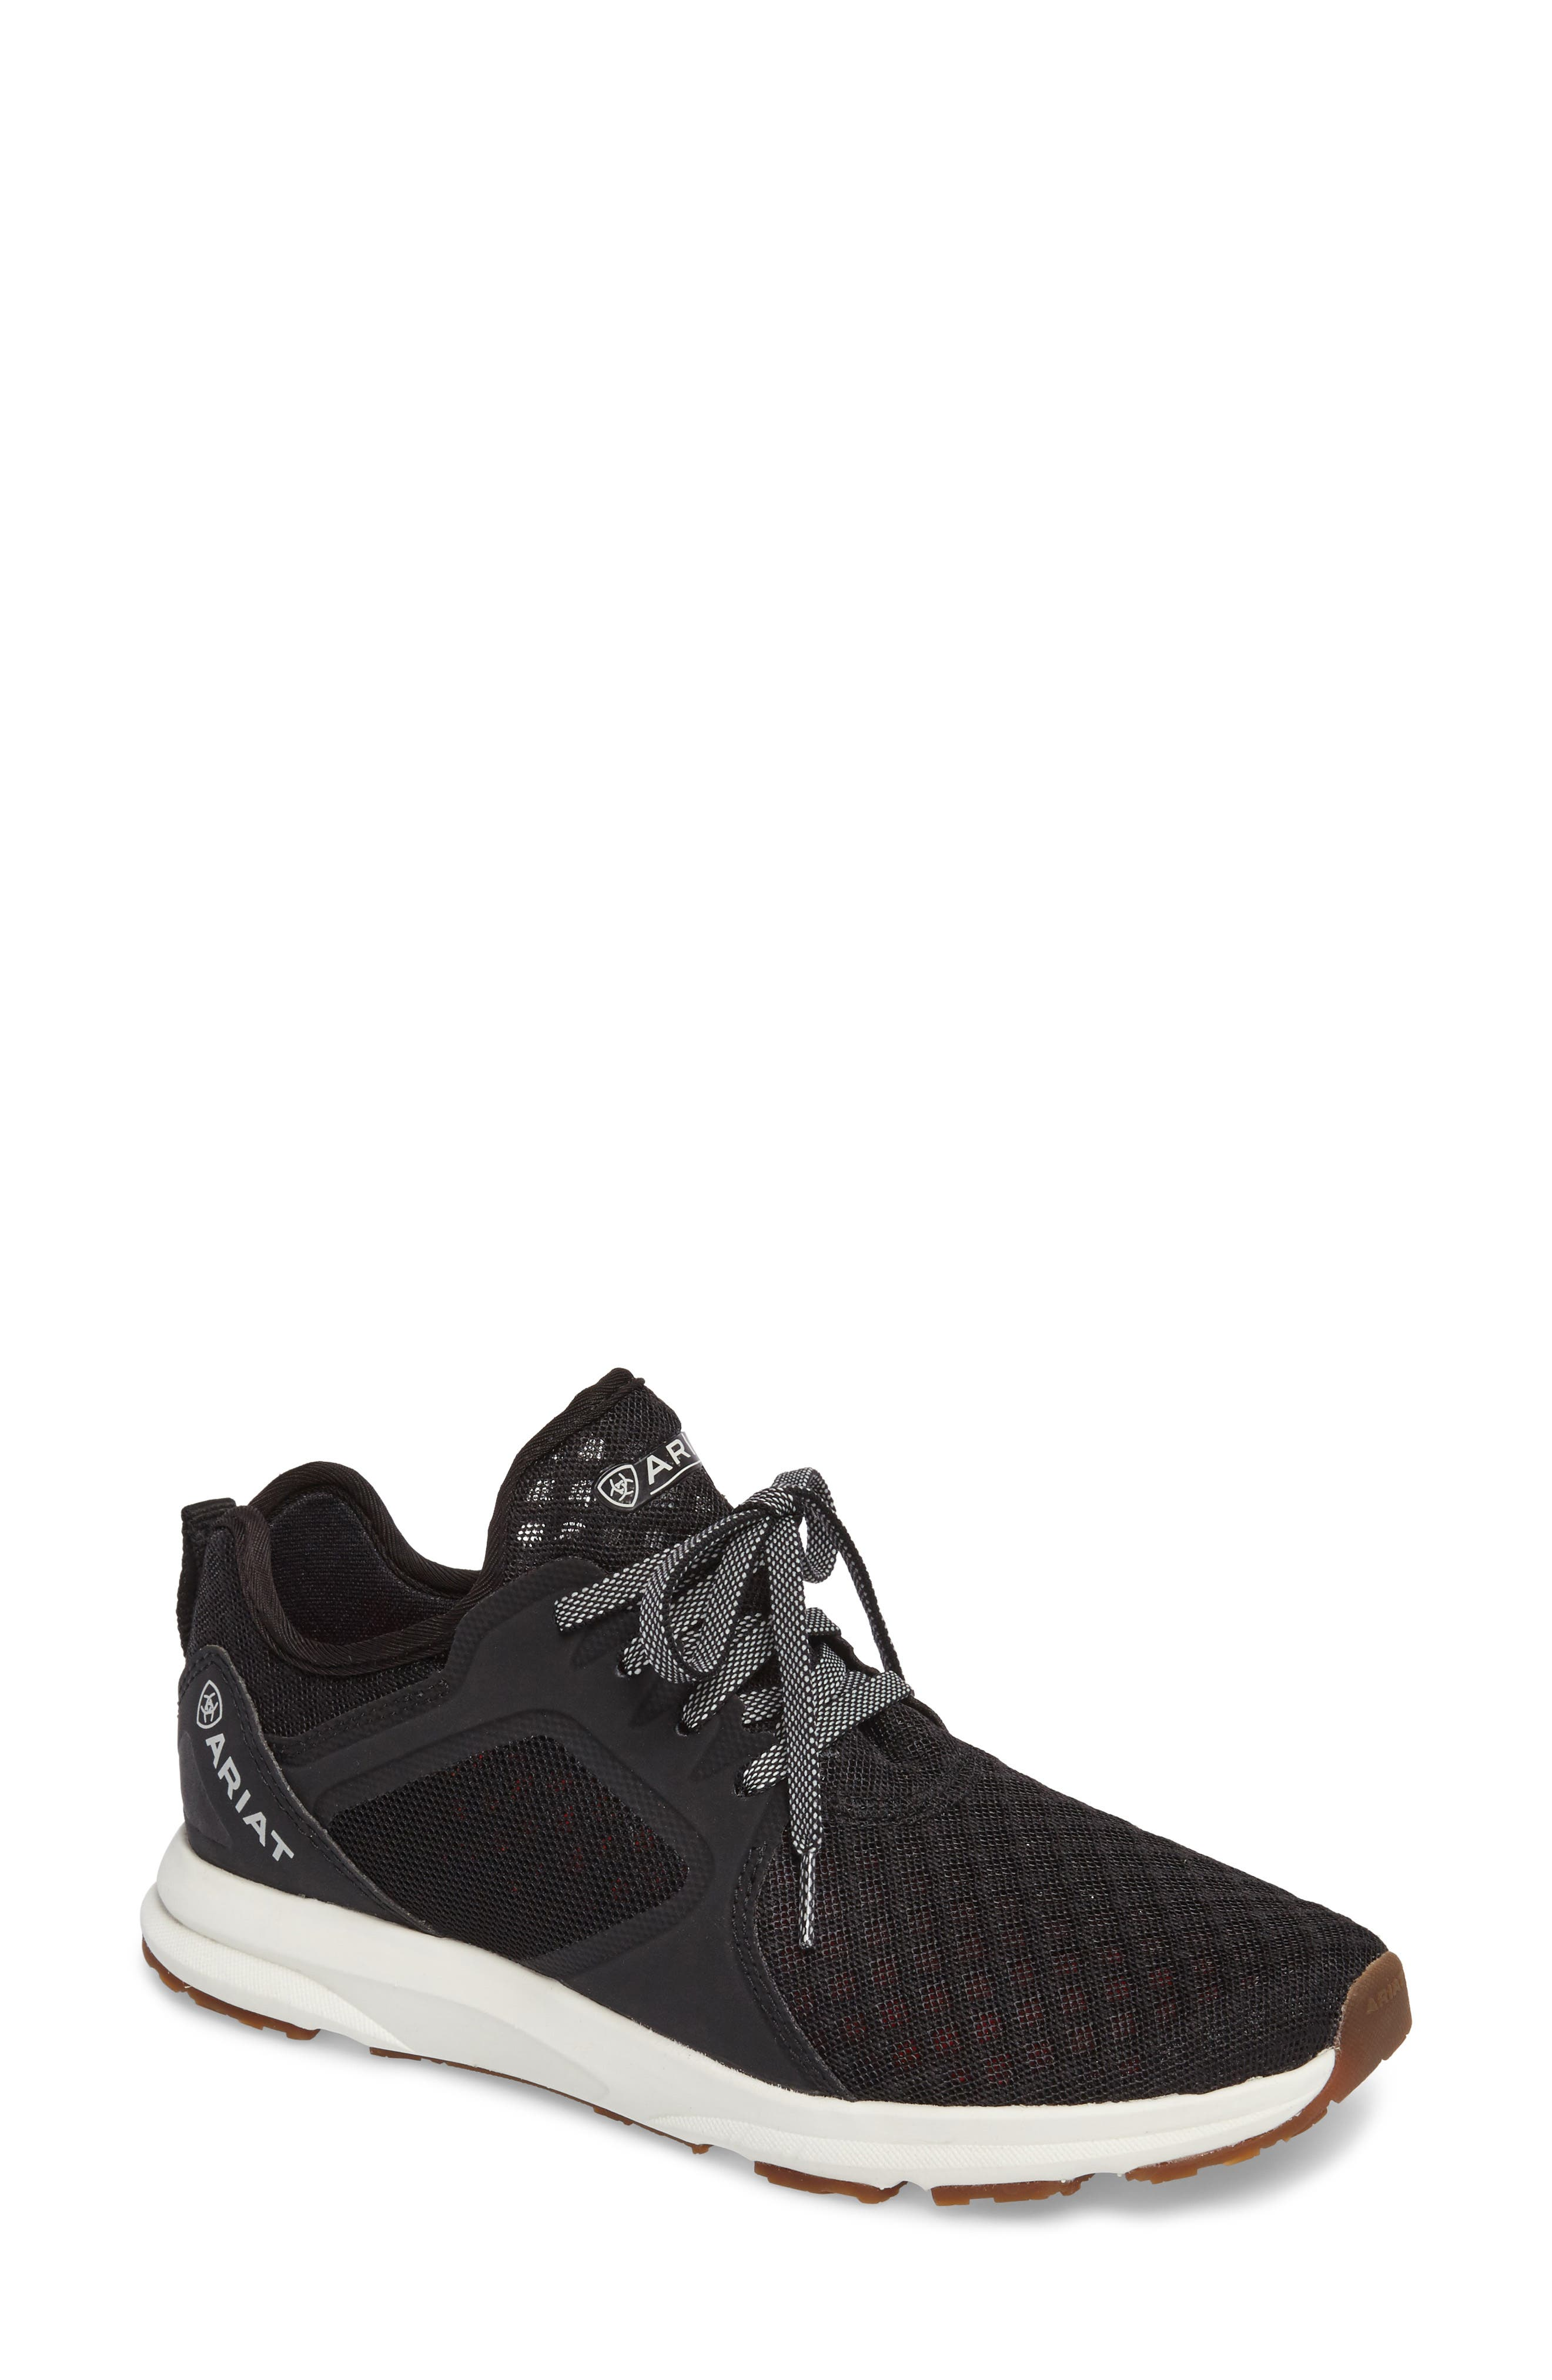 Fuse Sneaker,                             Main thumbnail 1, color,                             001